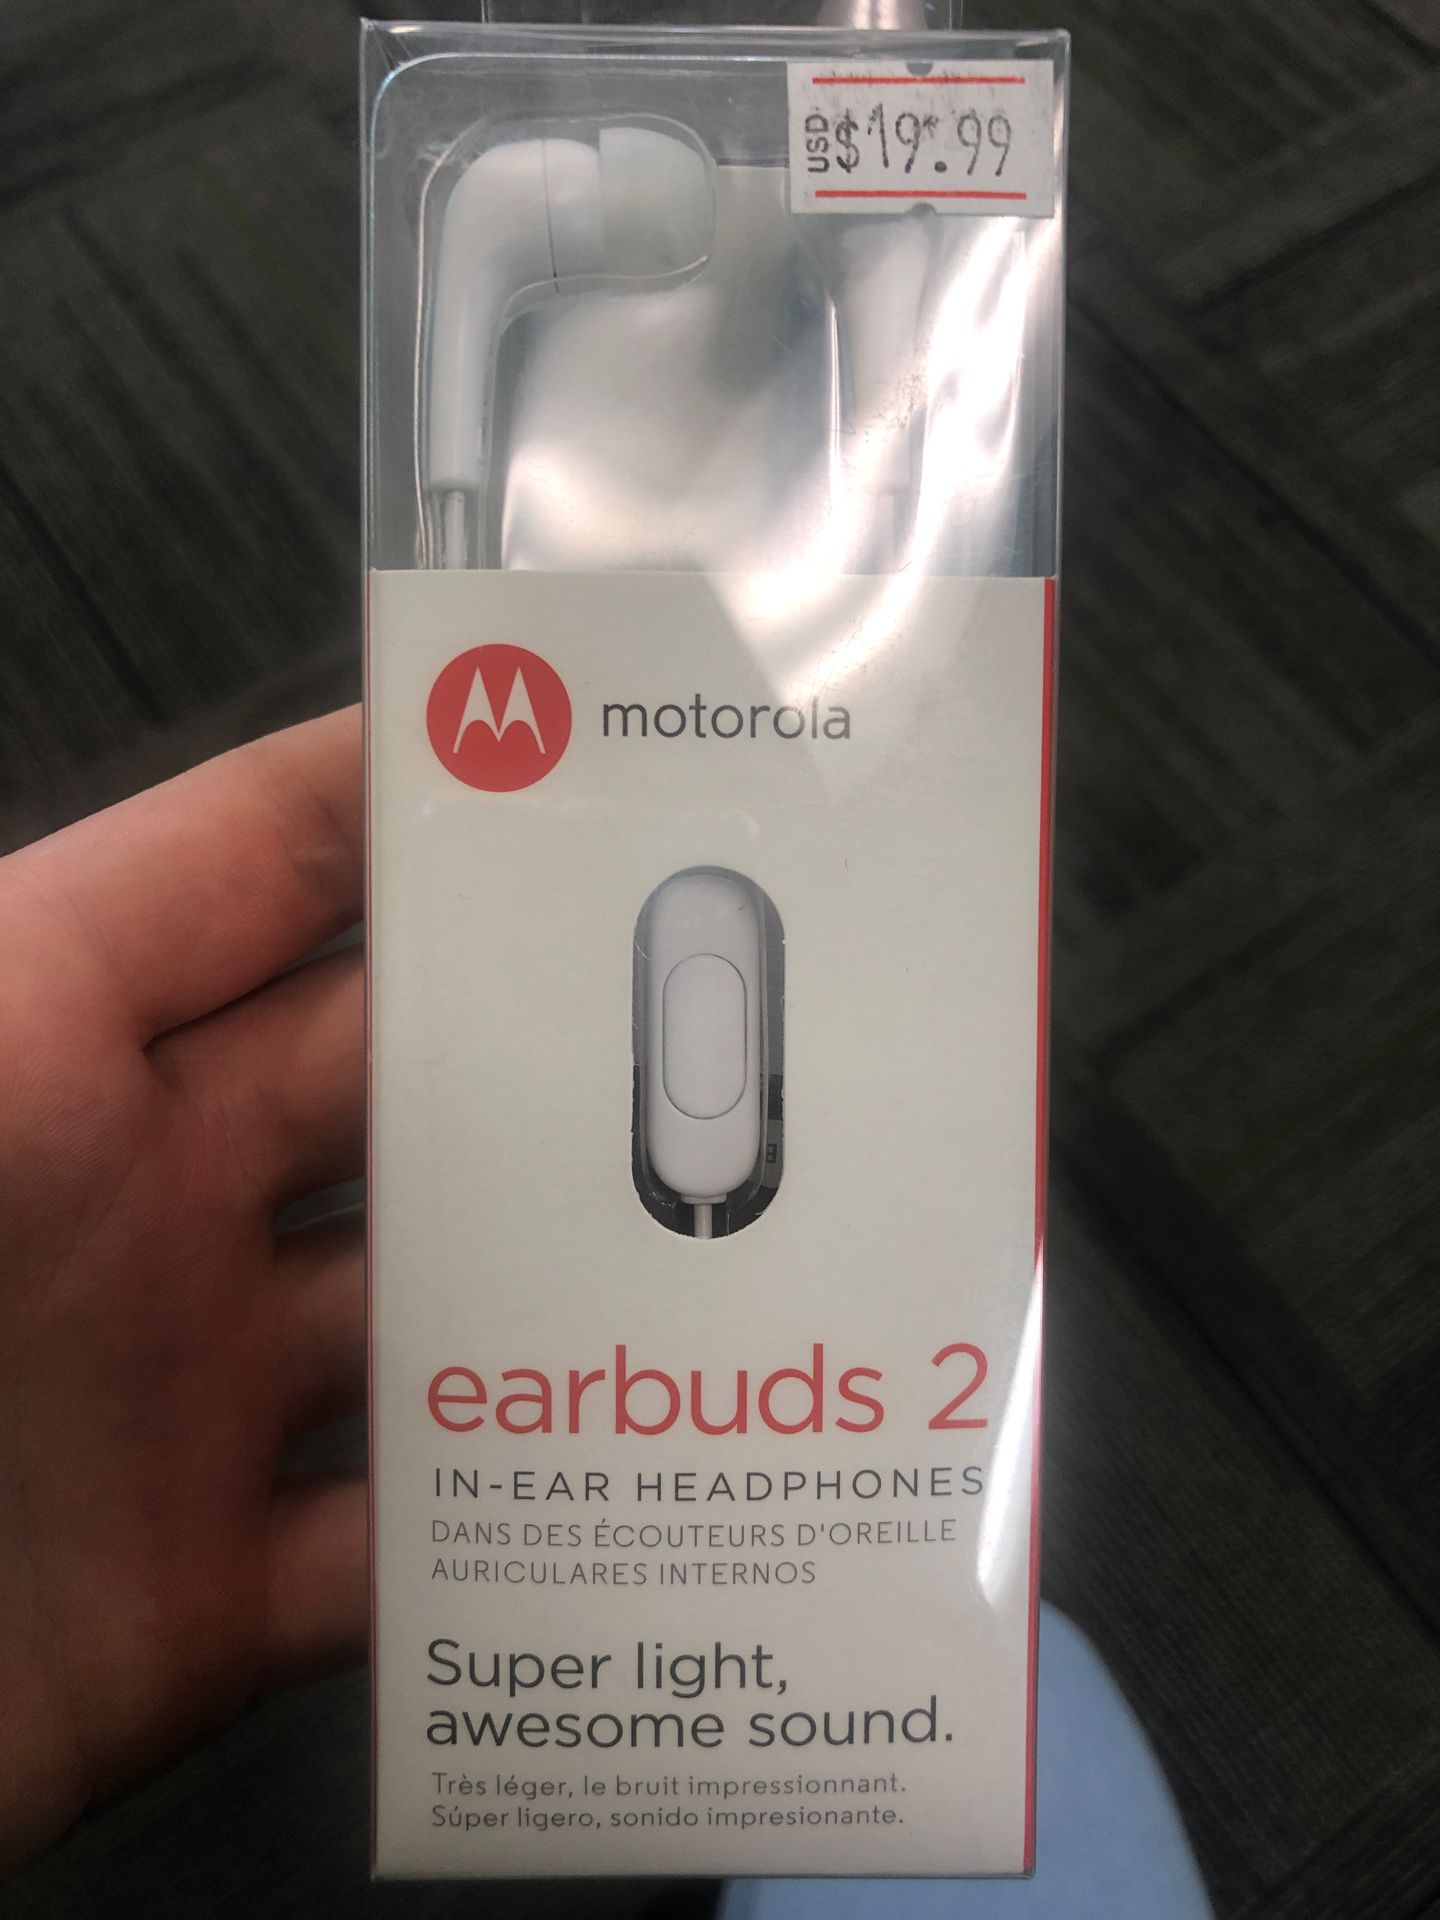 Motorola earbuds 2